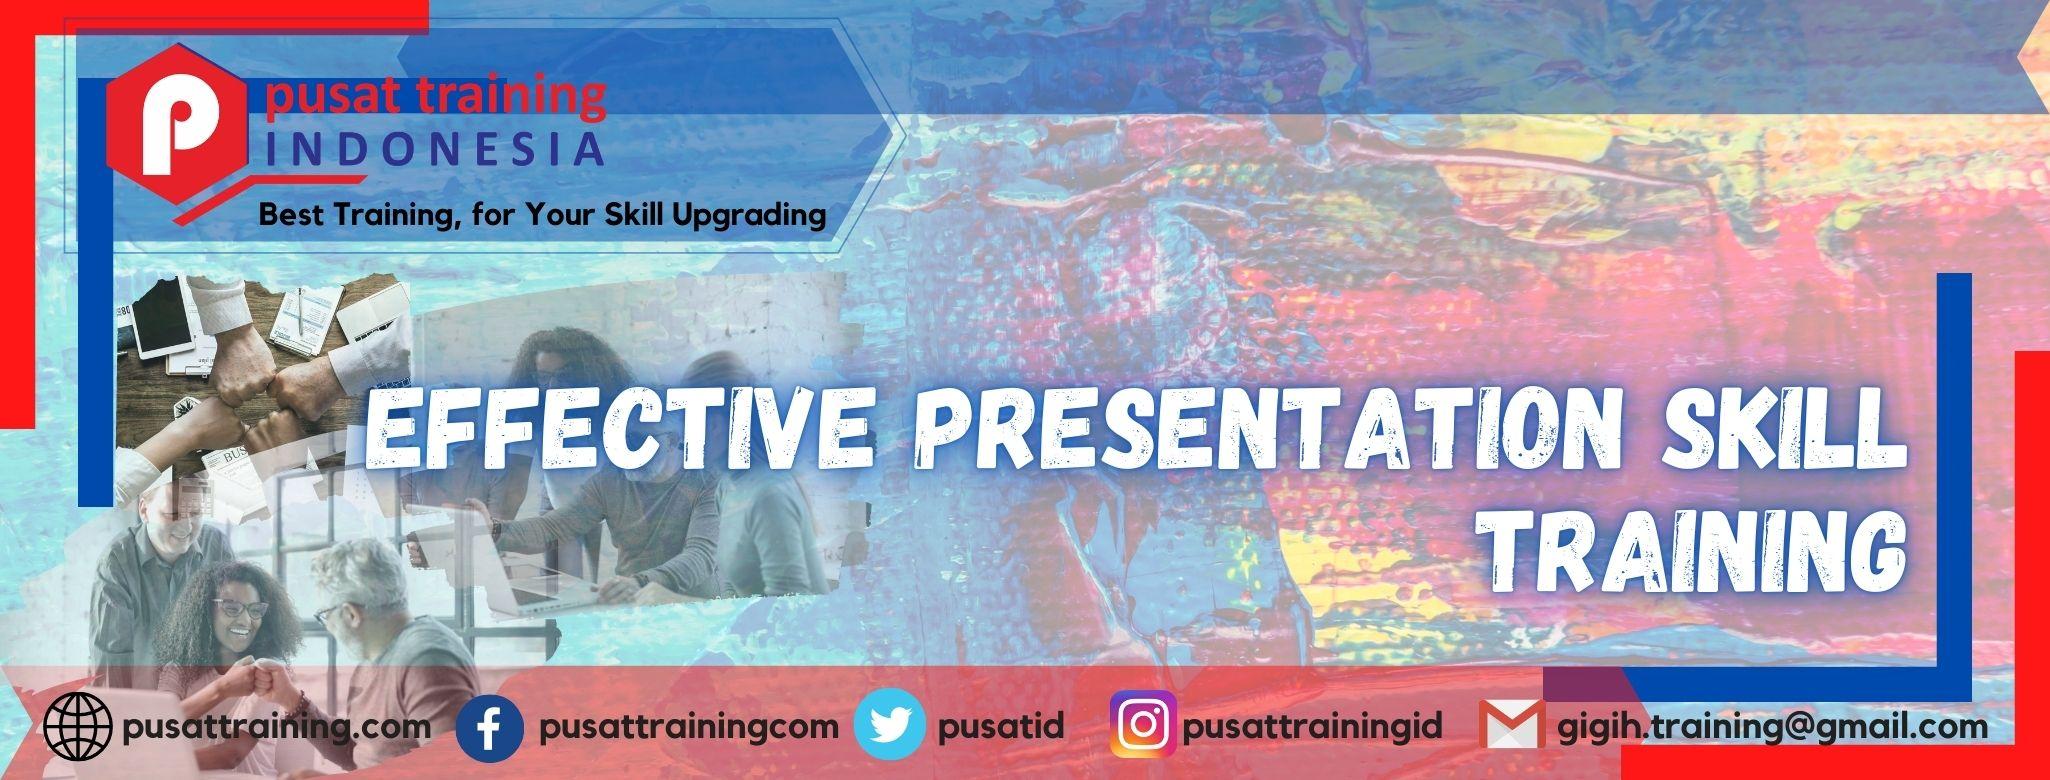 effective-presentation-skill-training